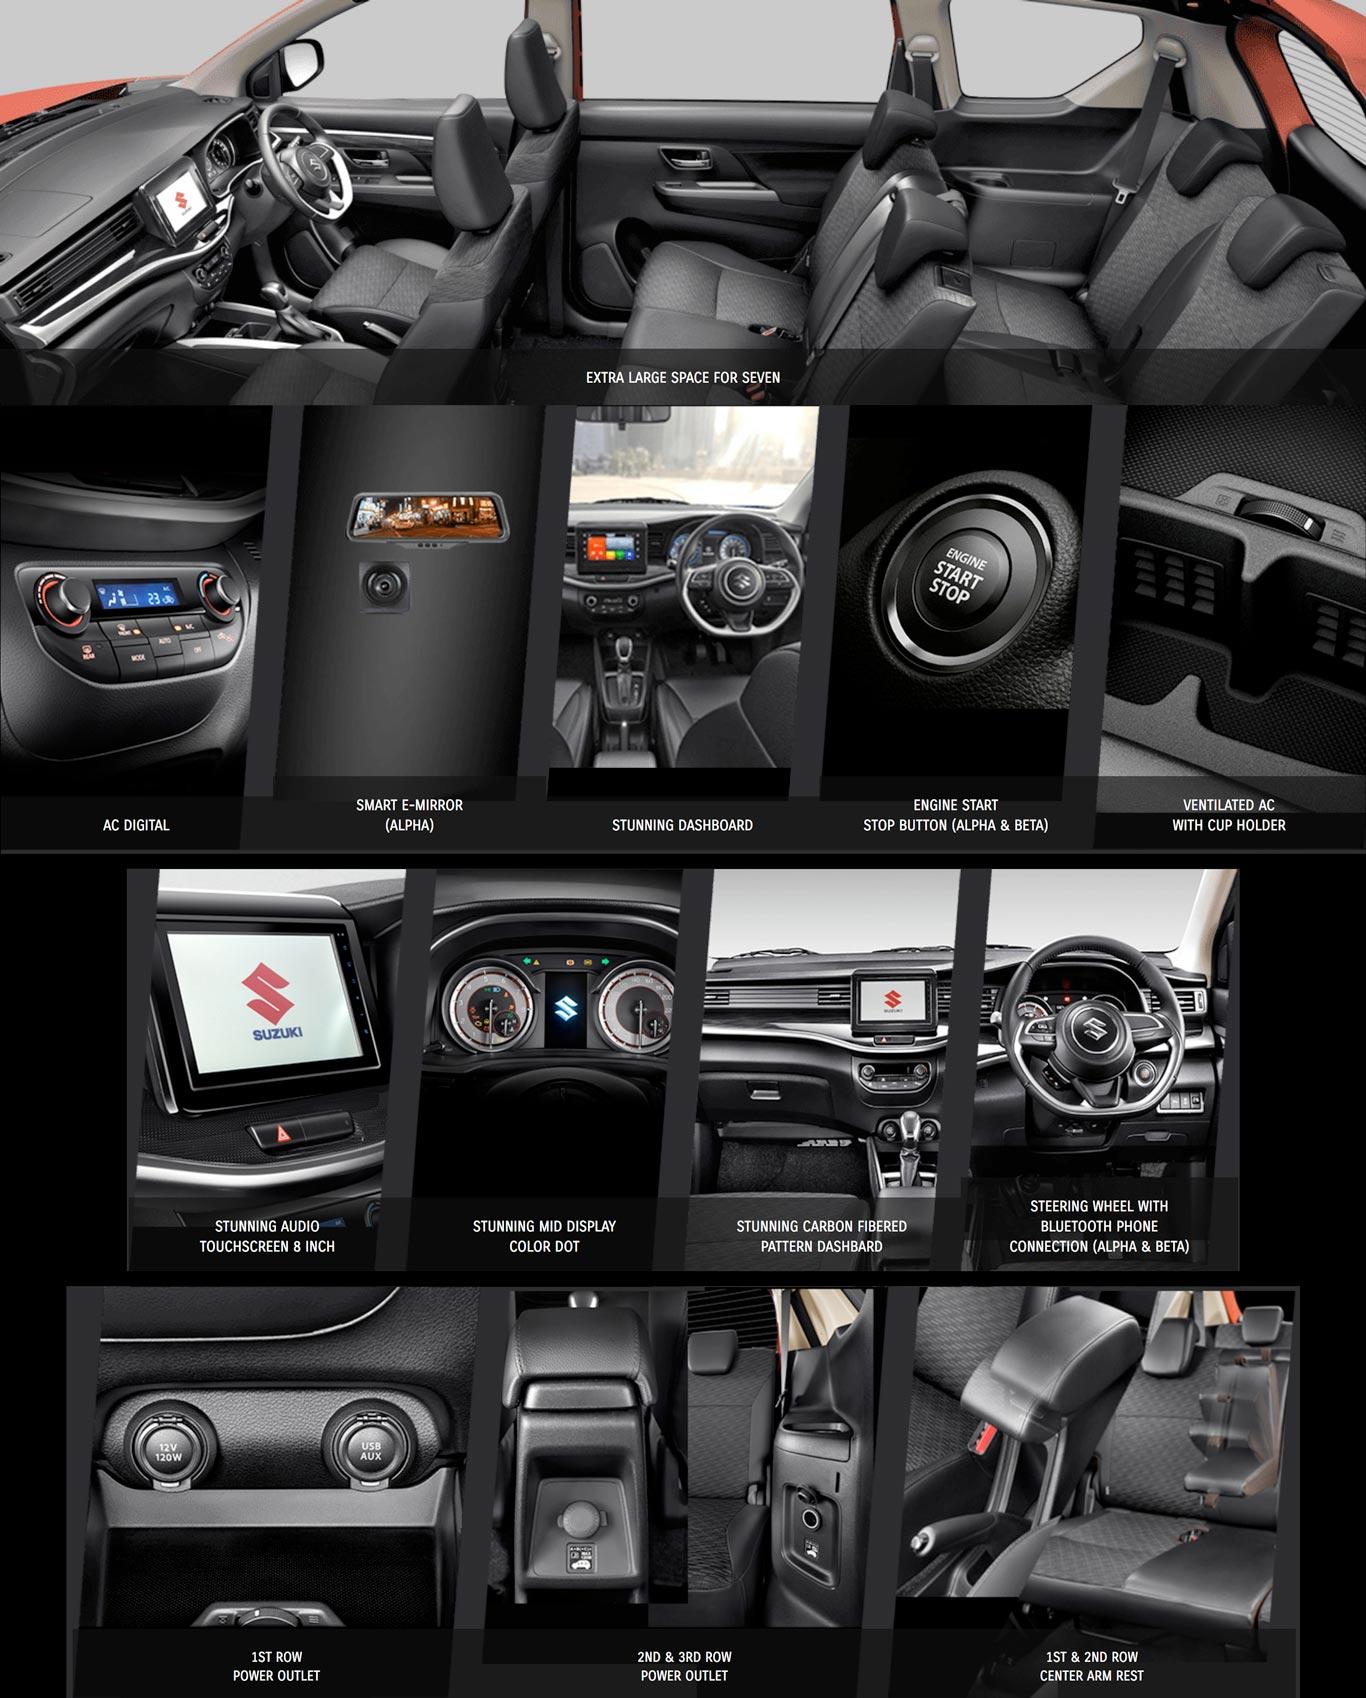 xl7-interior